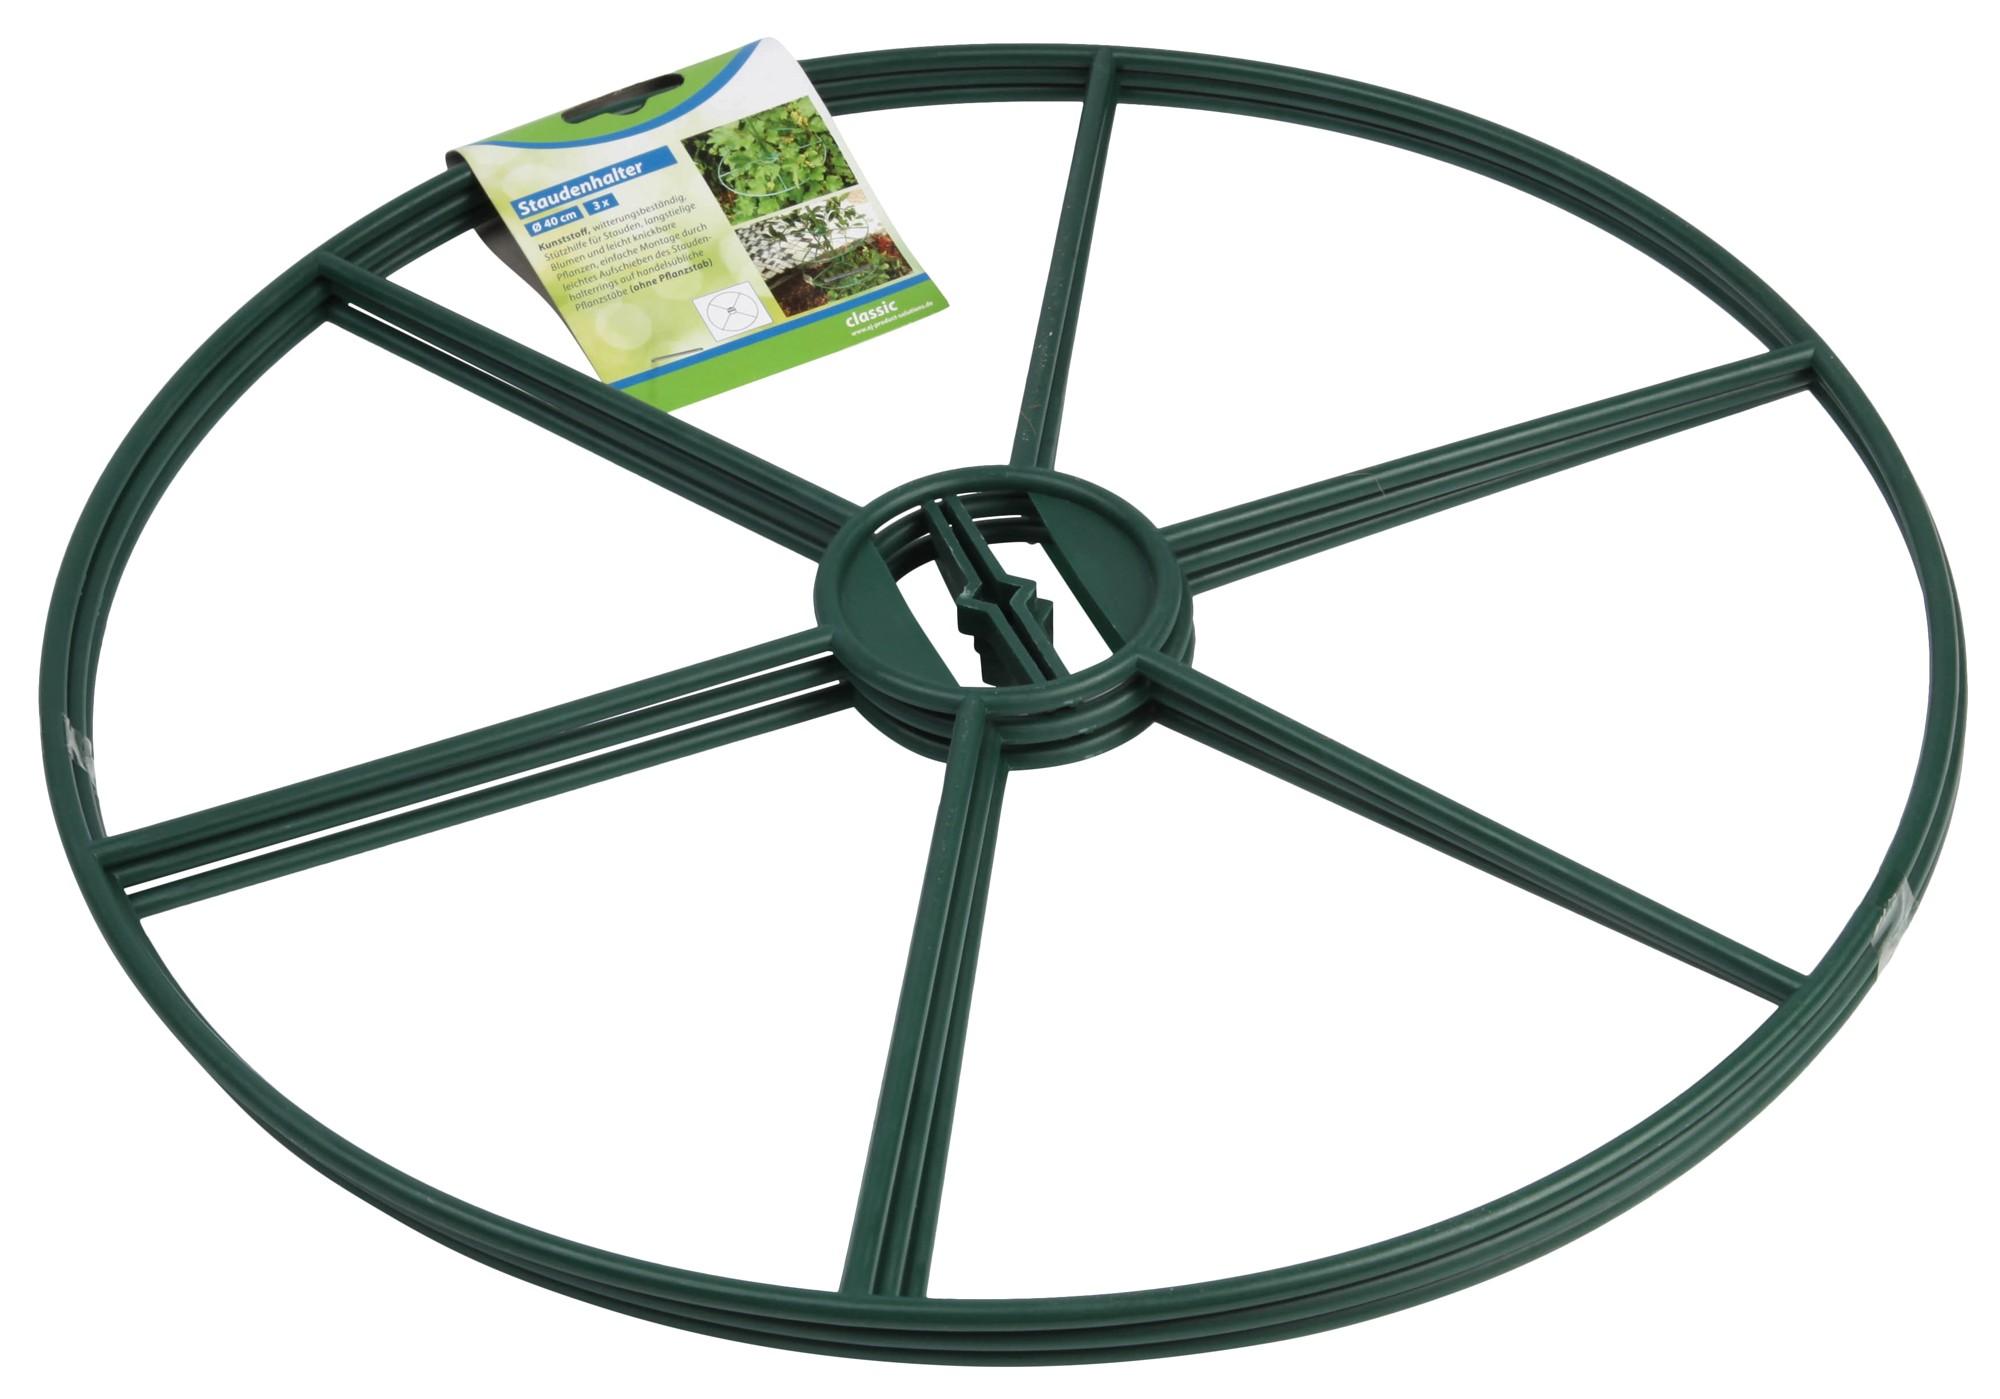 Staudenhalter / Rankhilfe classic floraworld Ø30cm grün Bild 1